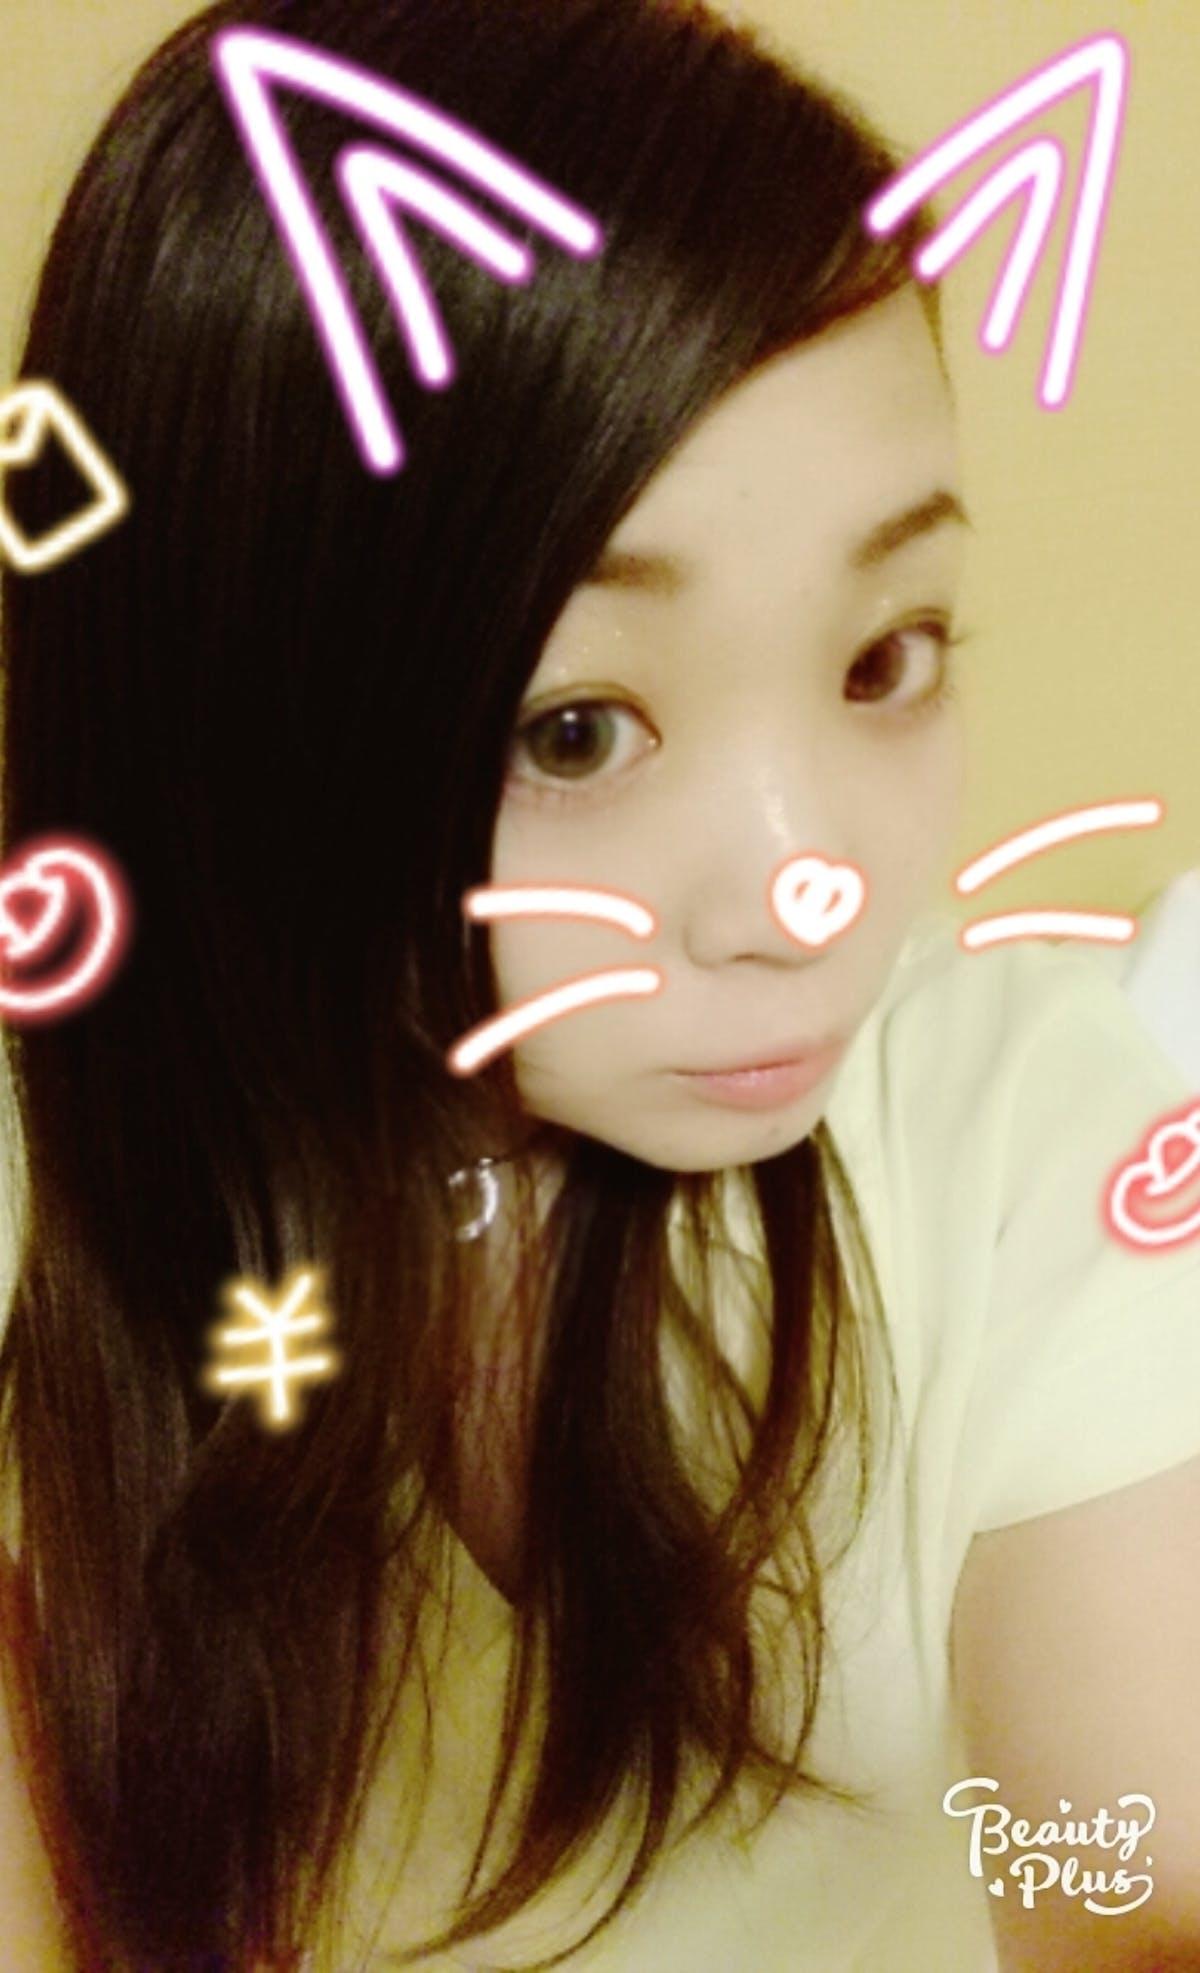 BeautyPlus_20170909184011_save.jpg